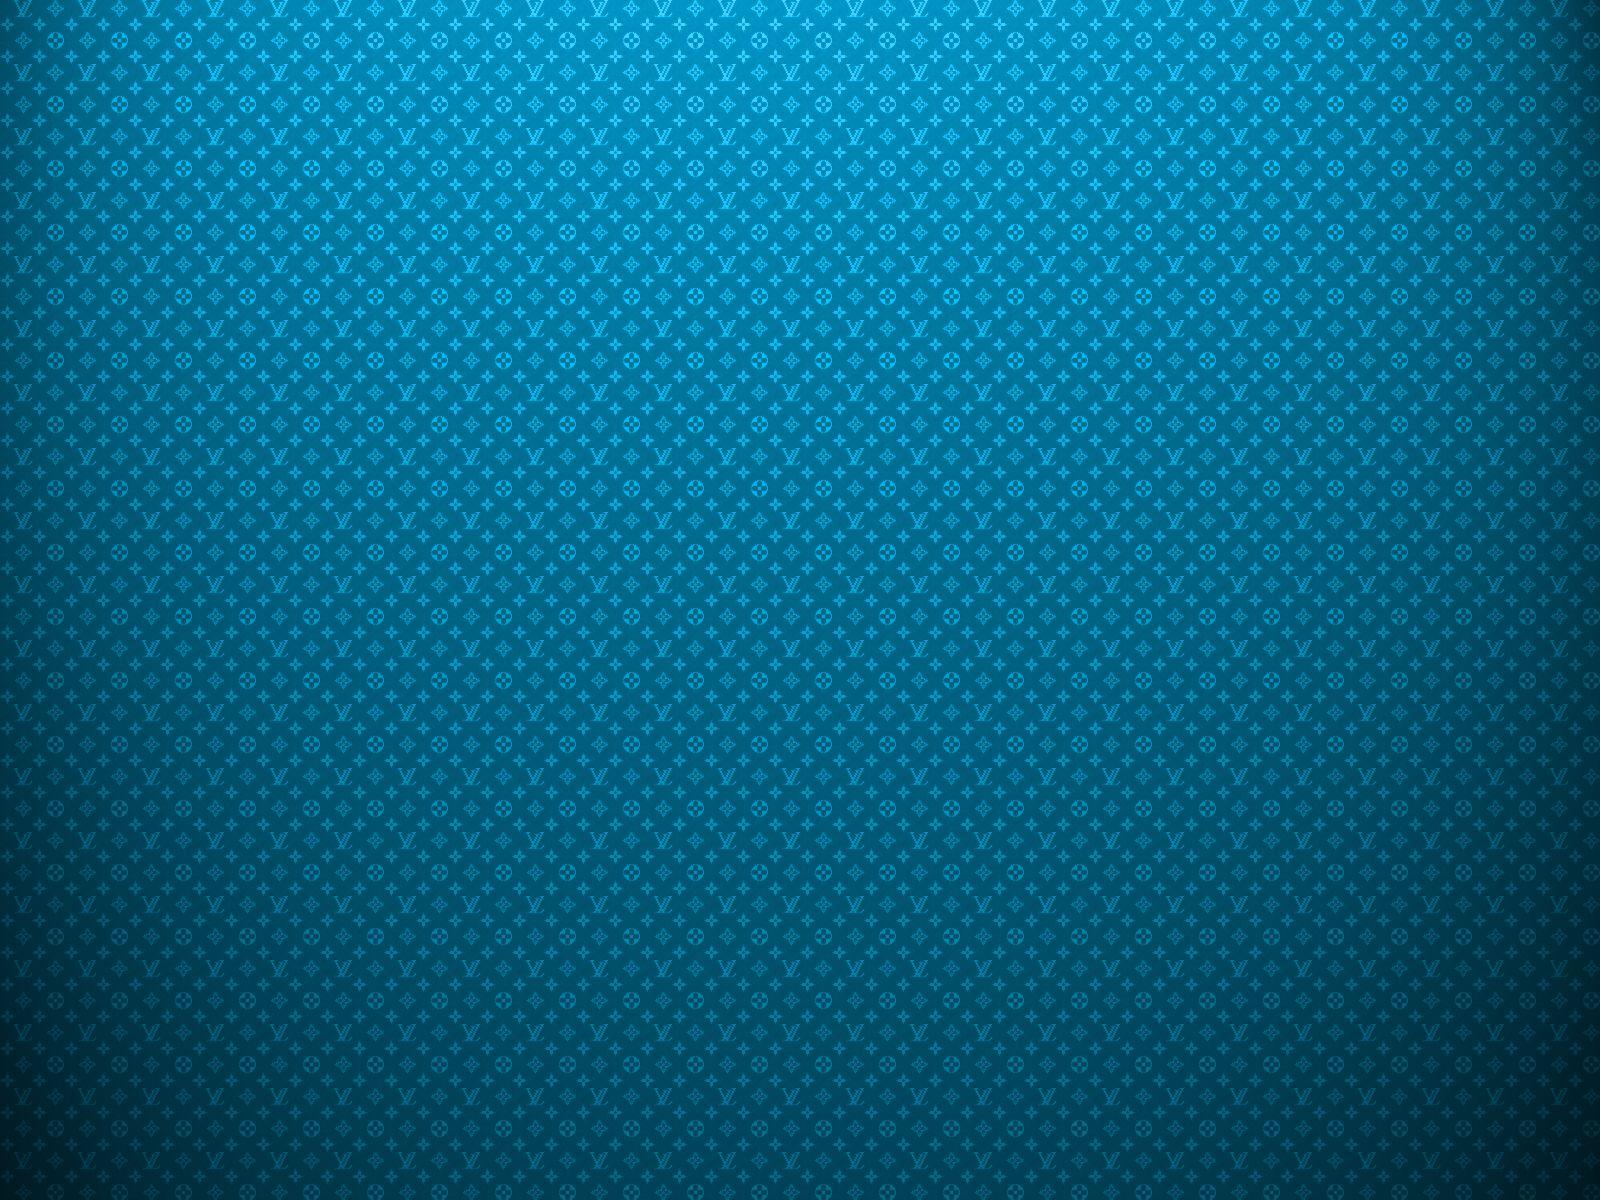 Louis Vuitton Blue Wallpapers on WallpaperDog